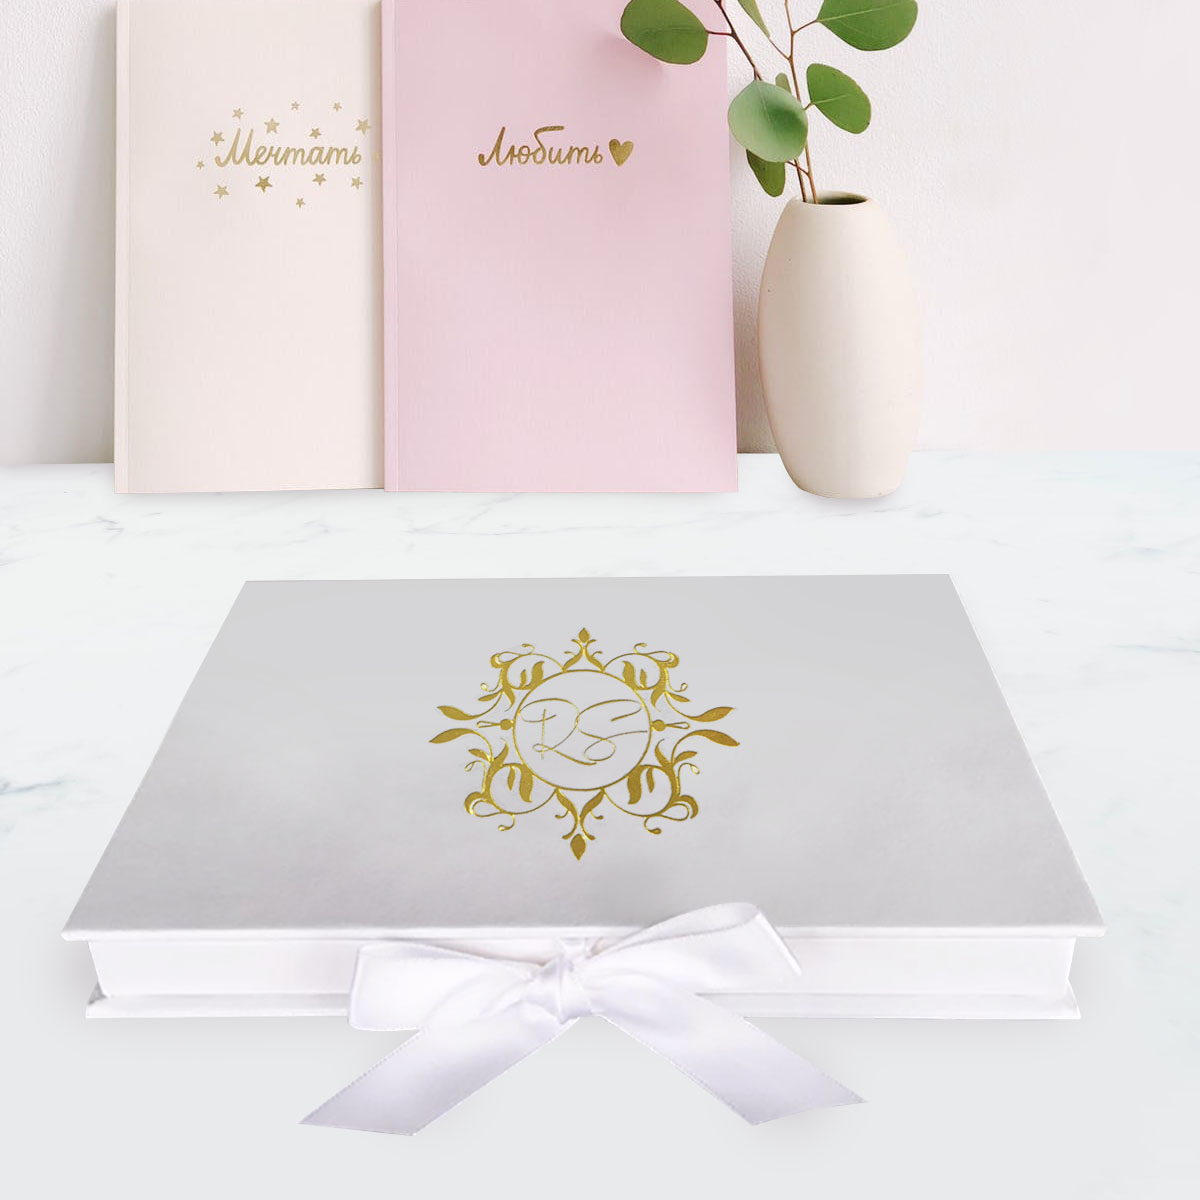 WEDDING INVITATION BOXES Archives - Luxury Wedding Invitations ...